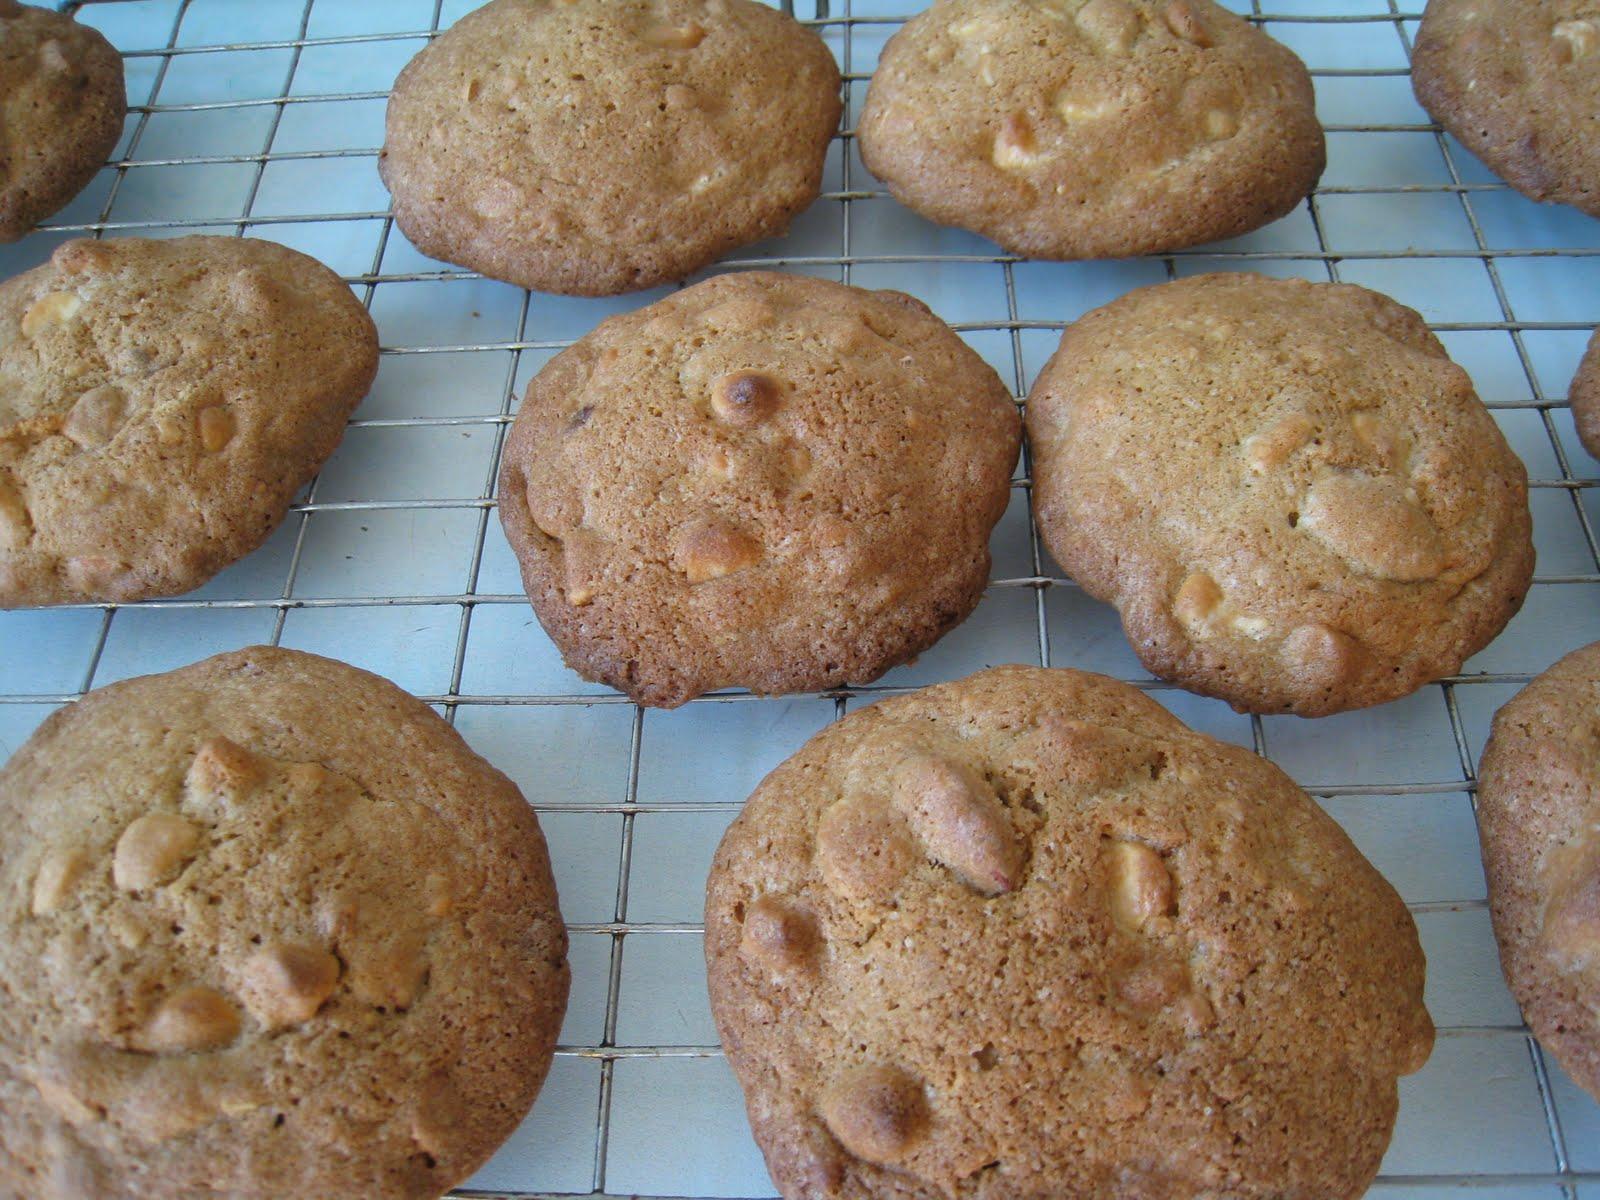 Macadamia Nut Cookie Recipes Food Network